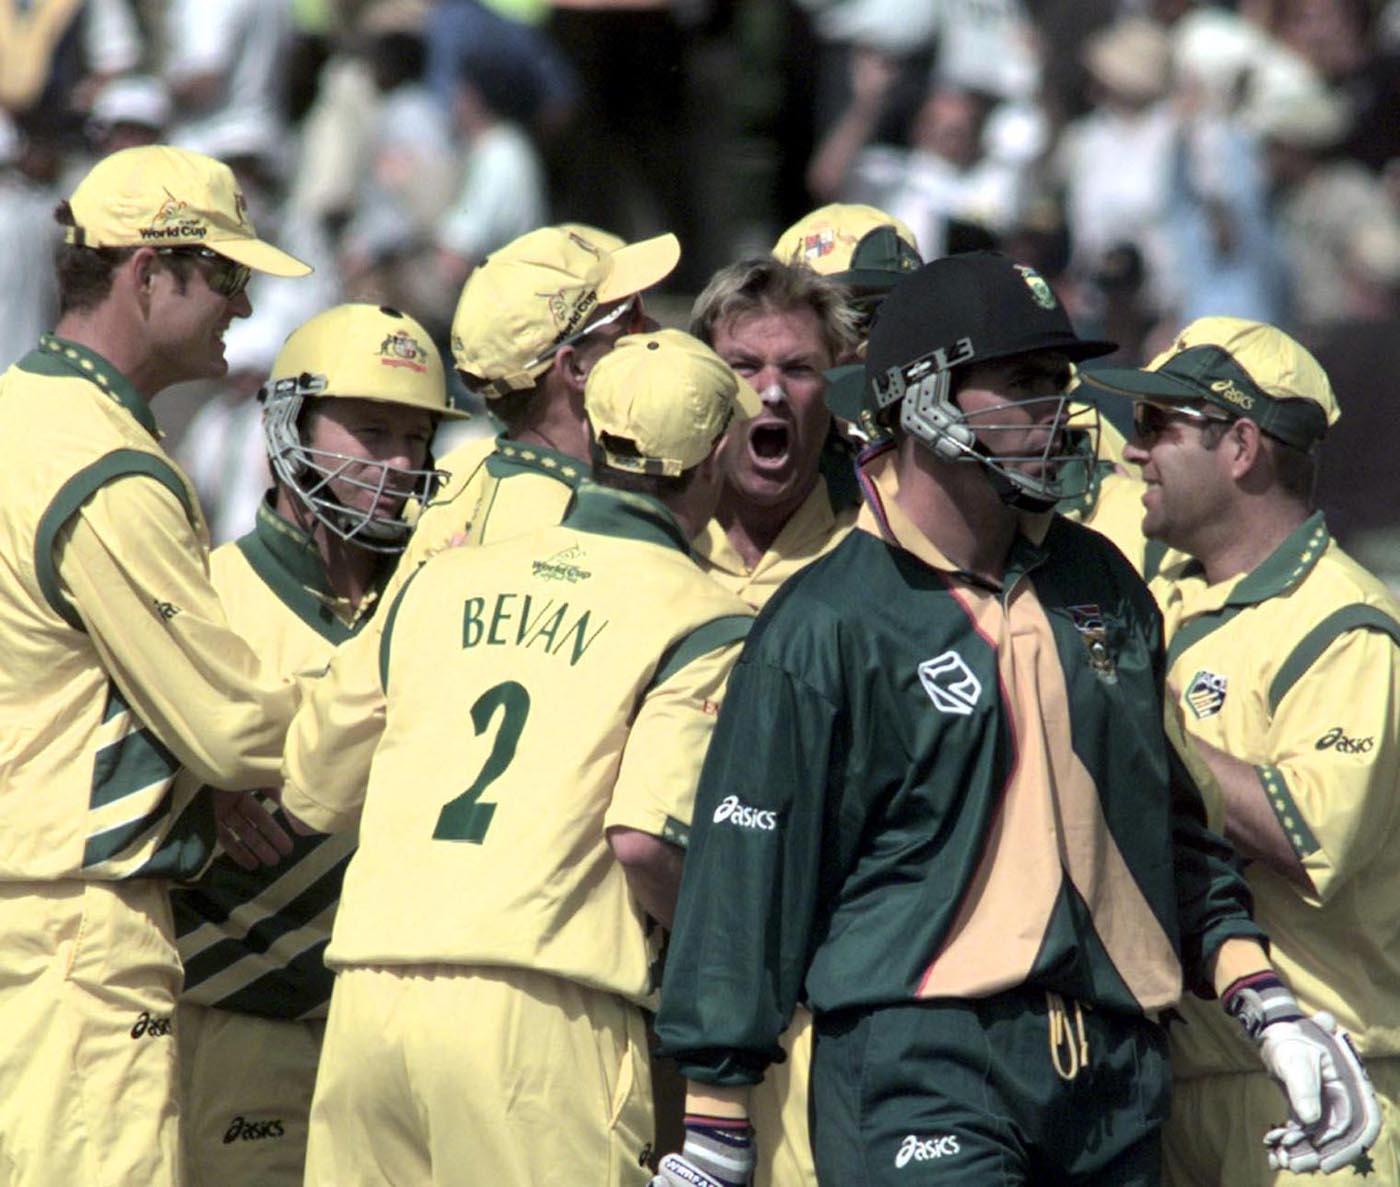 Scream with me, Edgbaston: Warne dismissed Hansie Cronje - his third wicket - for a duck